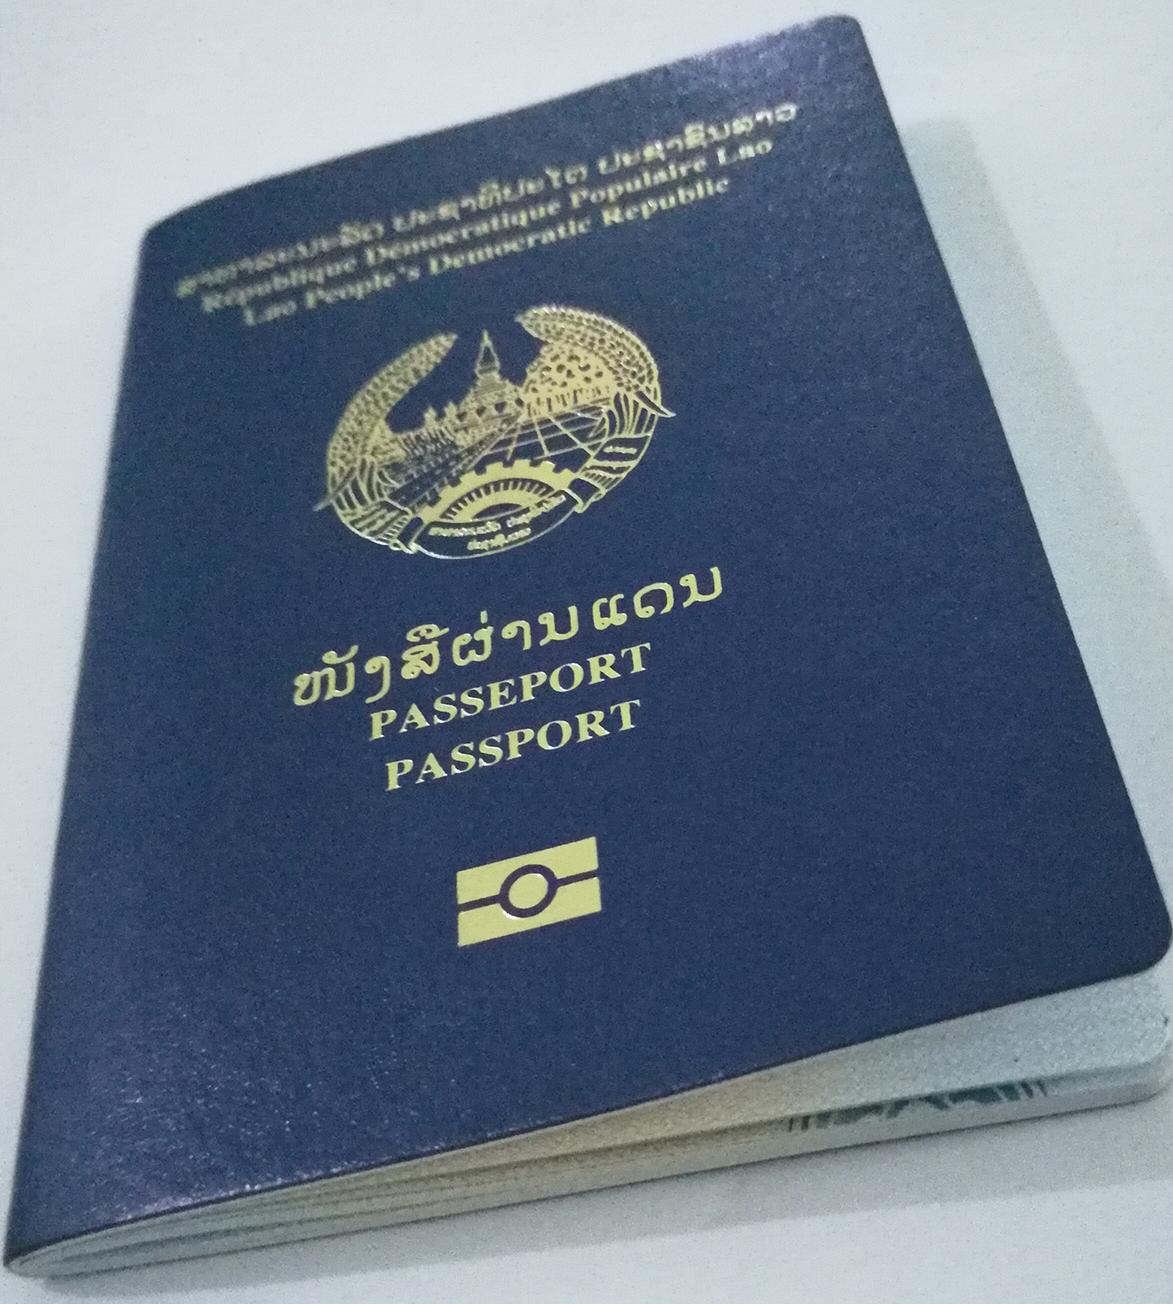 2000s in fashion - Wikipedia Best way to get a passport photo